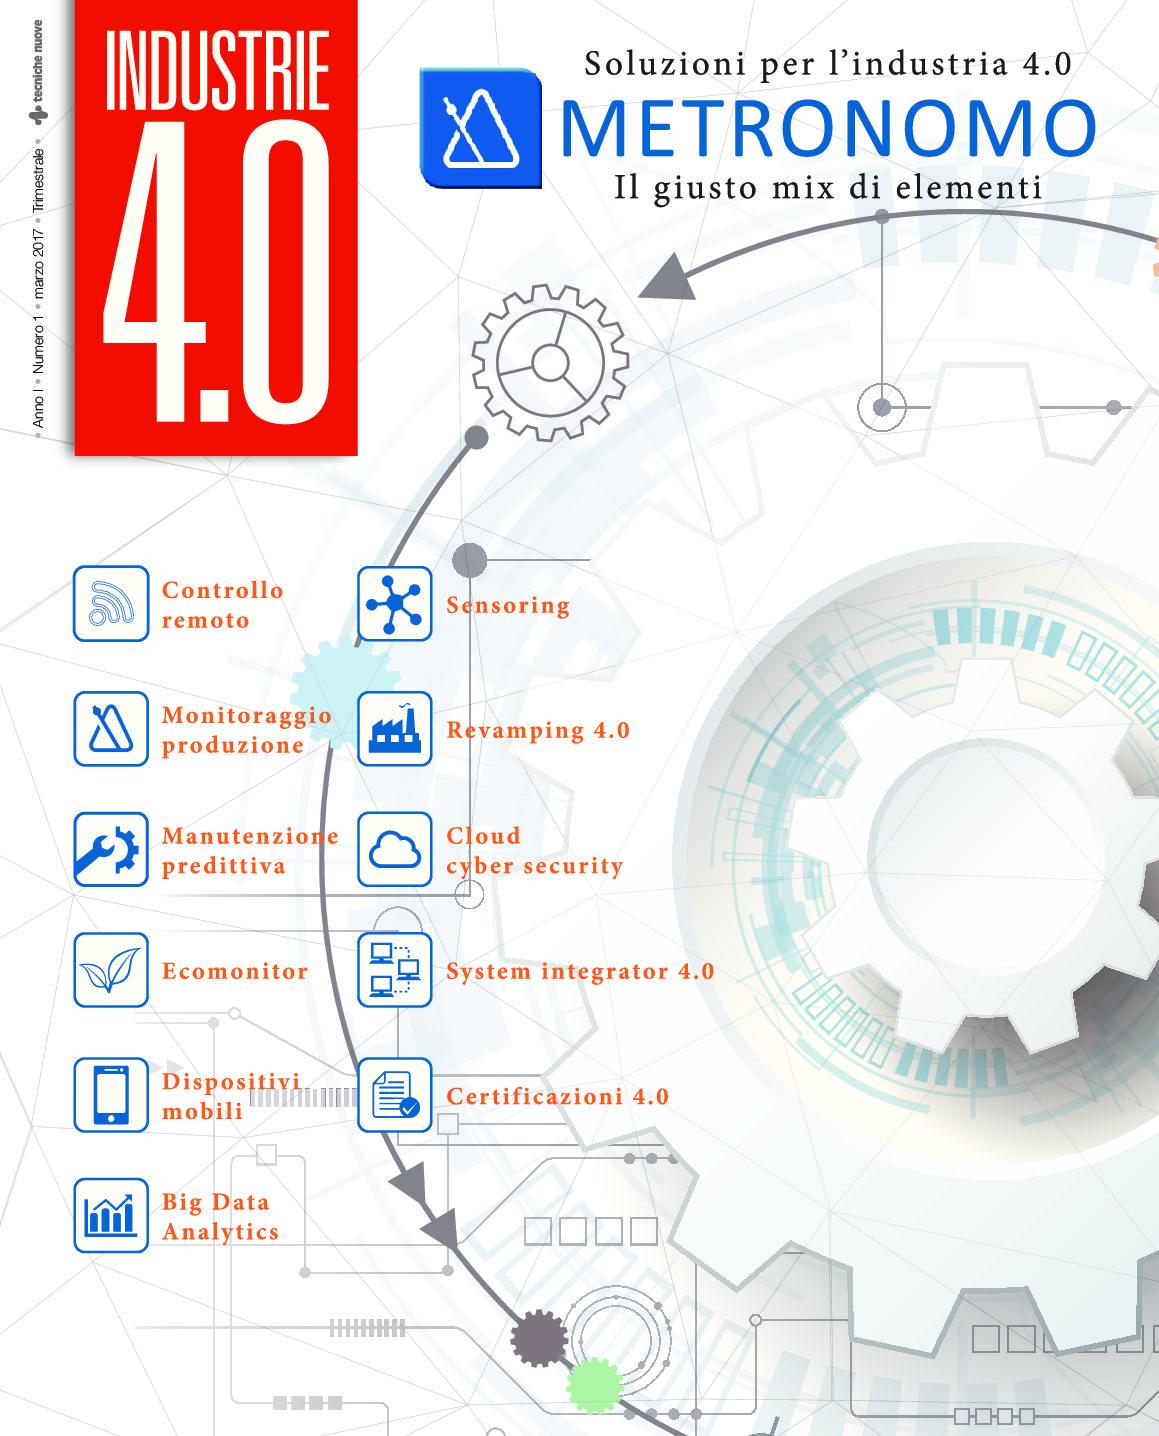 industrie 4.0 mecspe waterjet